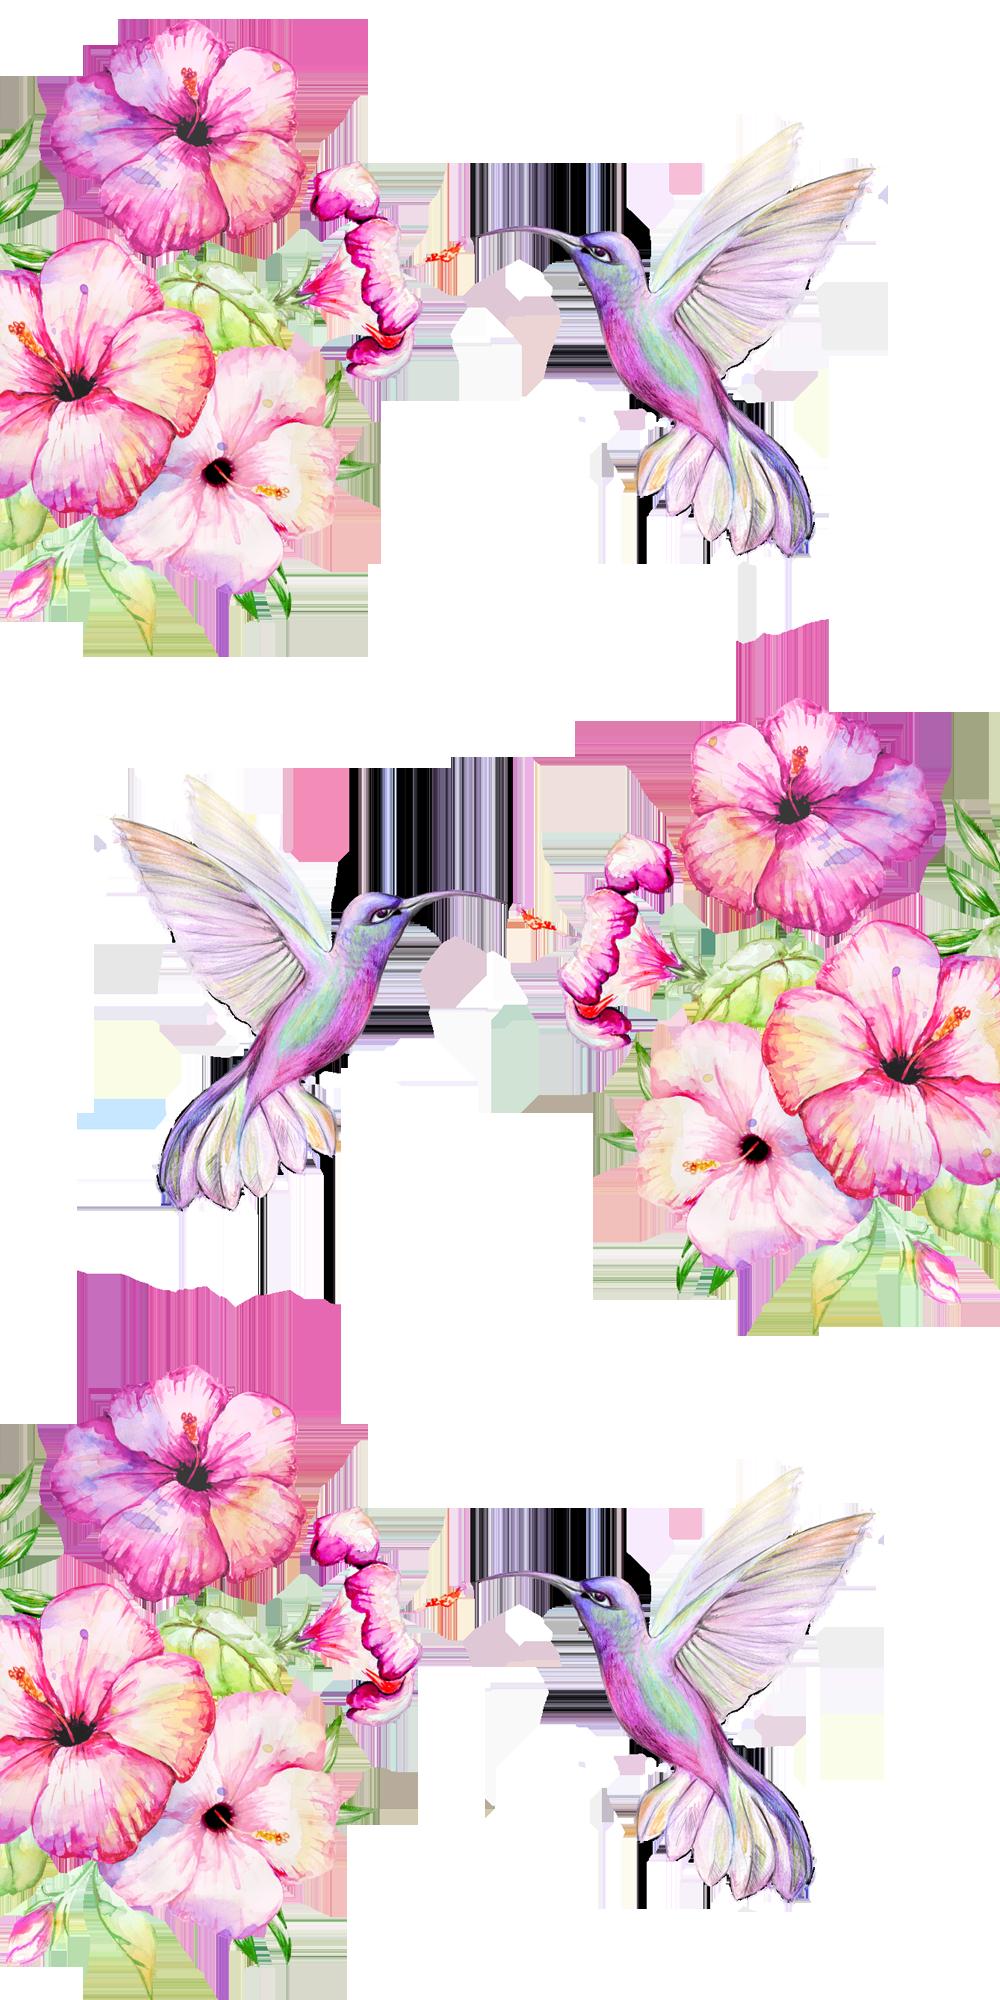 Iphone 8 Case Tropical Birds And Flowers By Karamfila Watercolor Hummingbird Bird Wallpaper Drawing Wallpaper